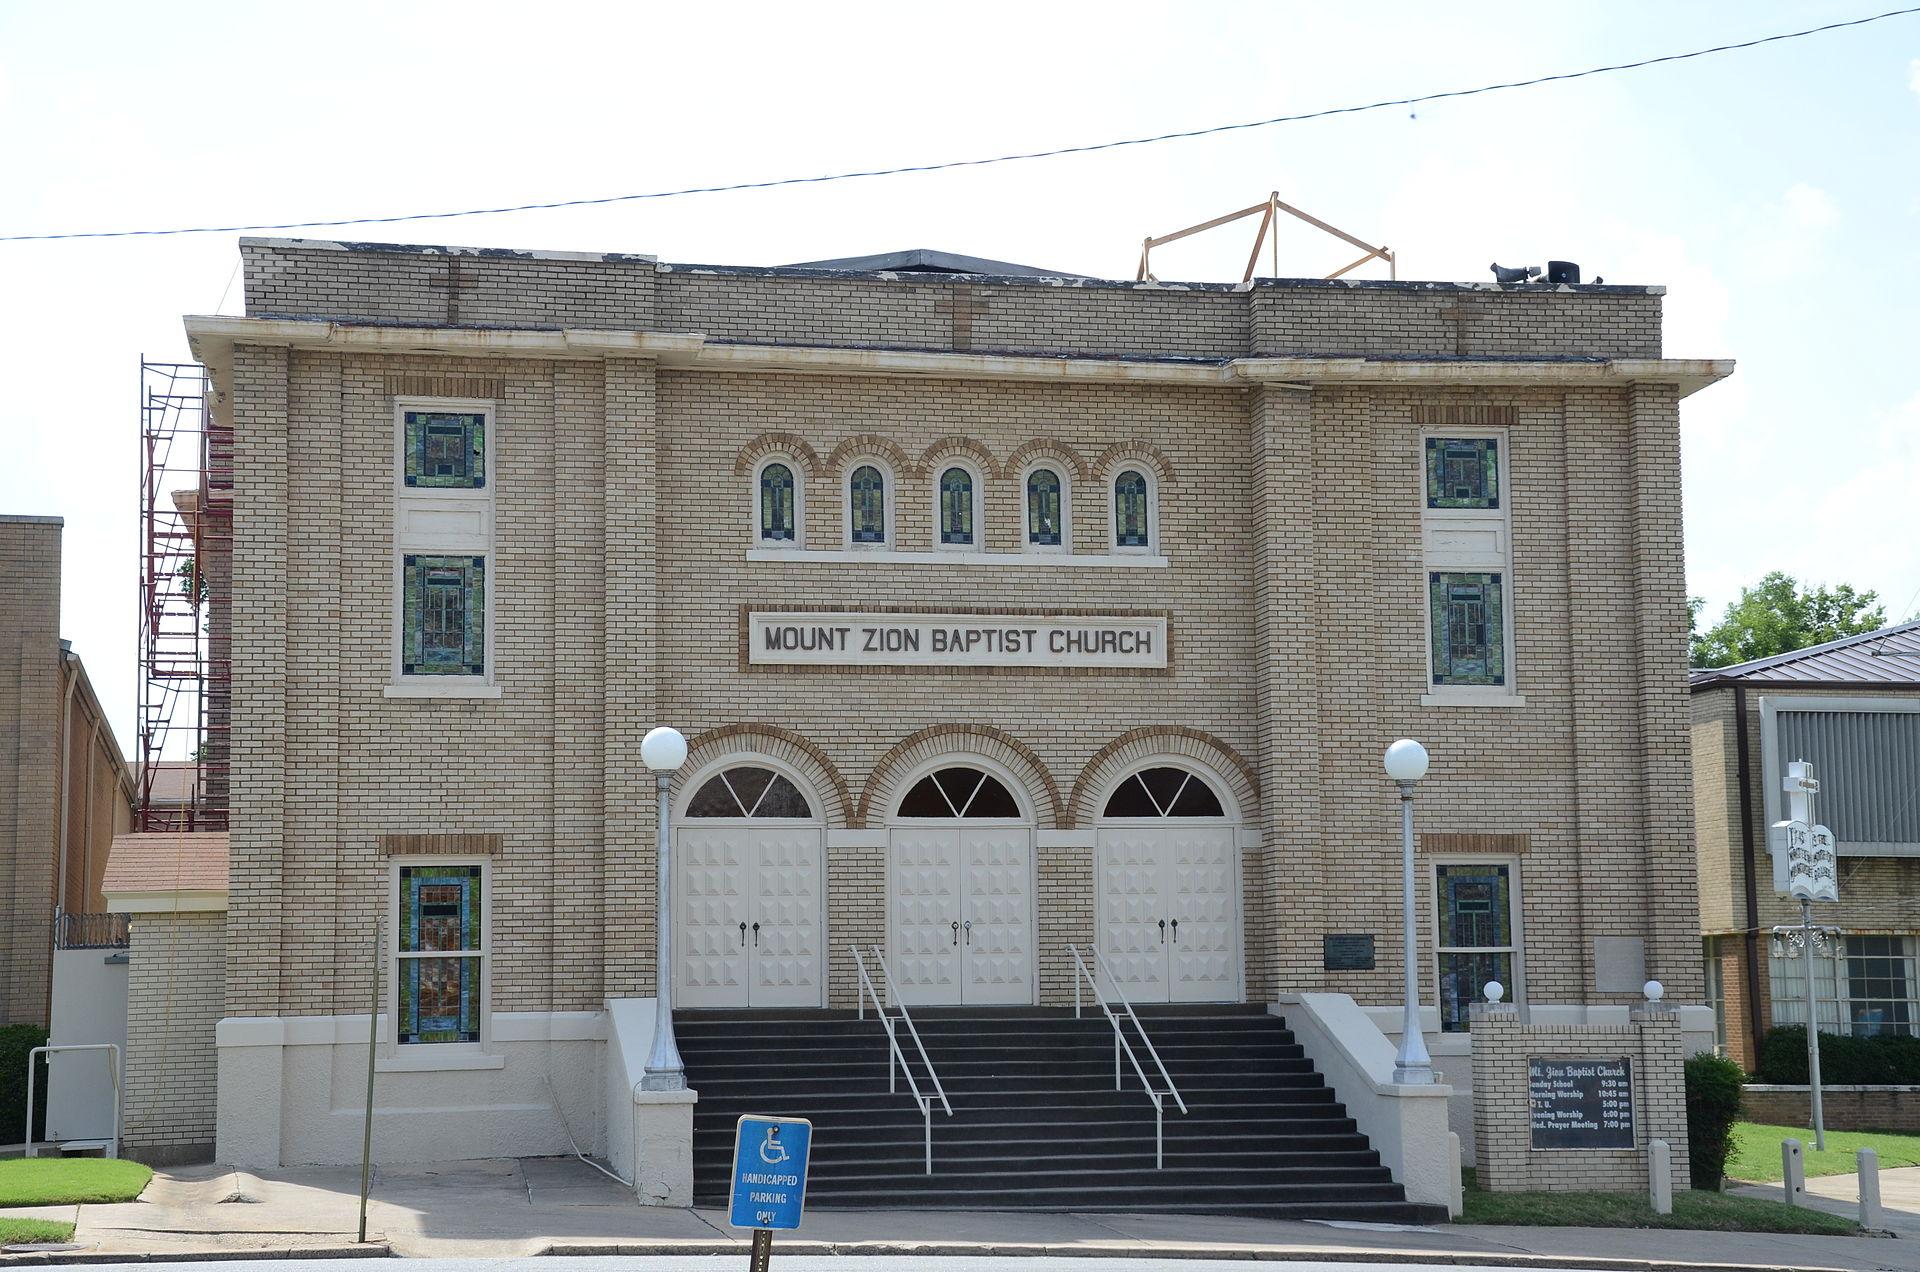 Mount_Zion_Baptist_Church,_Little_Rock,_AR